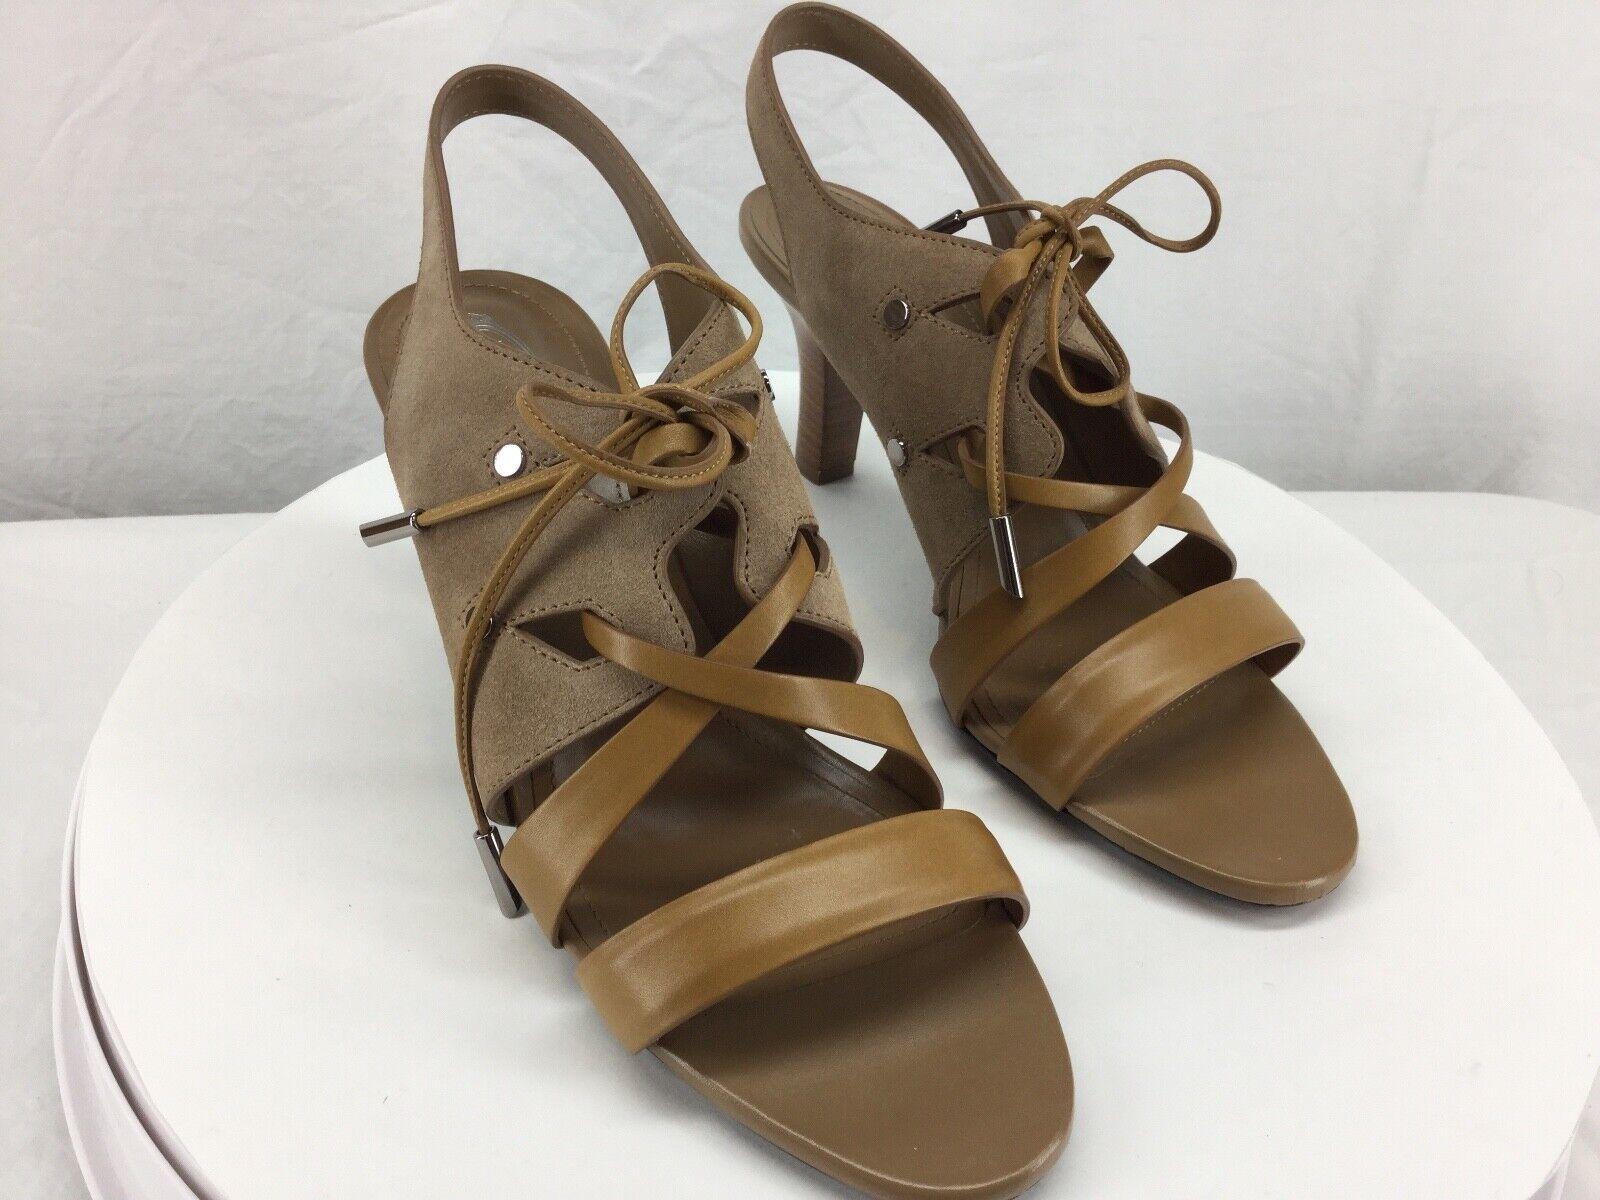 Tods Tan Suede Leather Strappy Lace -Up Slingback Dress  Sandal US 9.5 Mai indossato  prendiamo i clienti come nostro dio